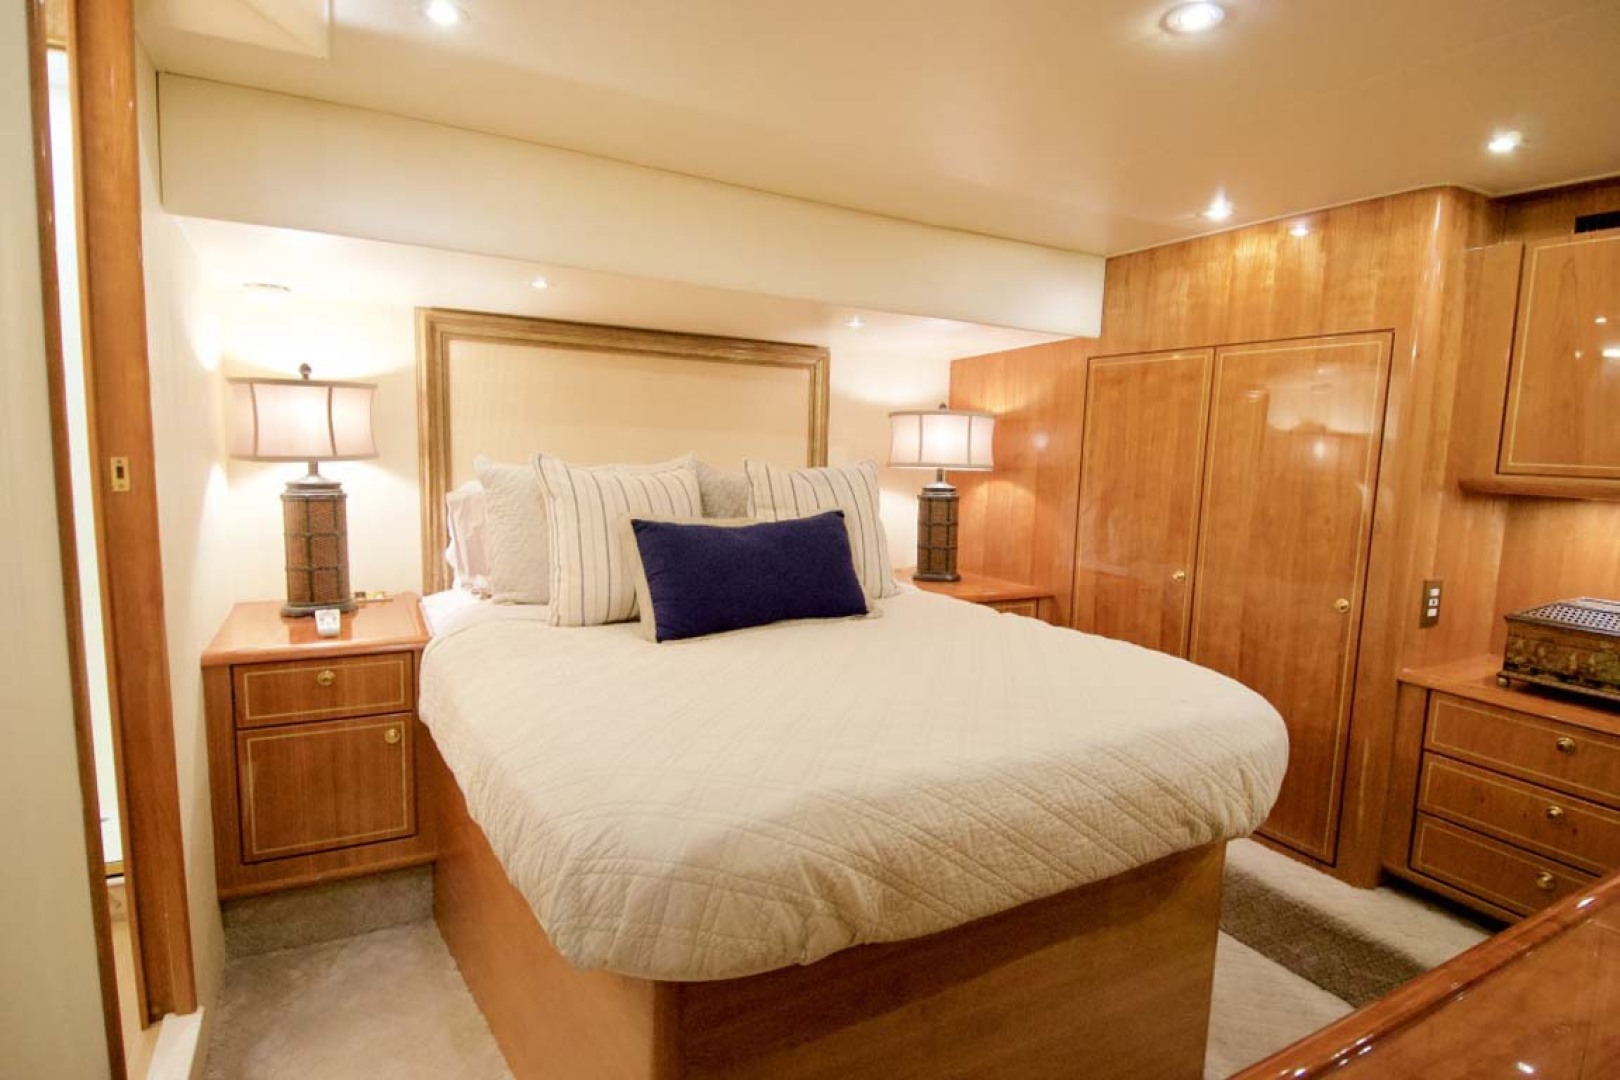 Ocean Yachts-57 SS 2006-Deliverance Stuart-Florida-United States-Master Stateroom-1102272 | Thumbnail